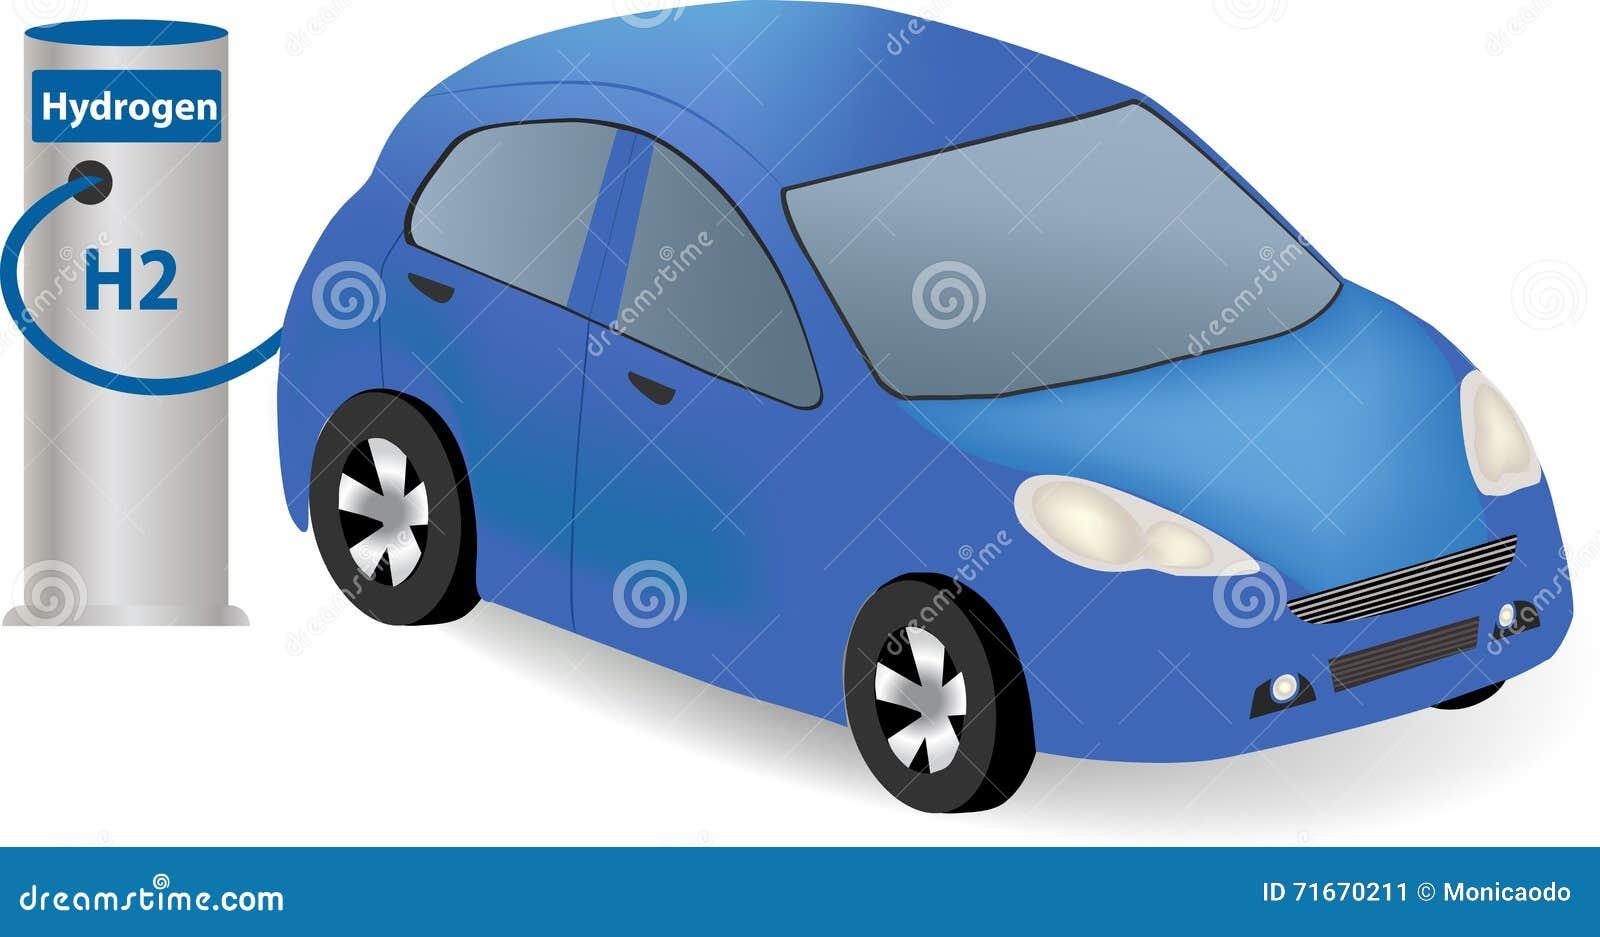 Hydrogen Fuel Cell Stock Illustrations 133 Diagram Infographic Vectors Clipart Dreamstime